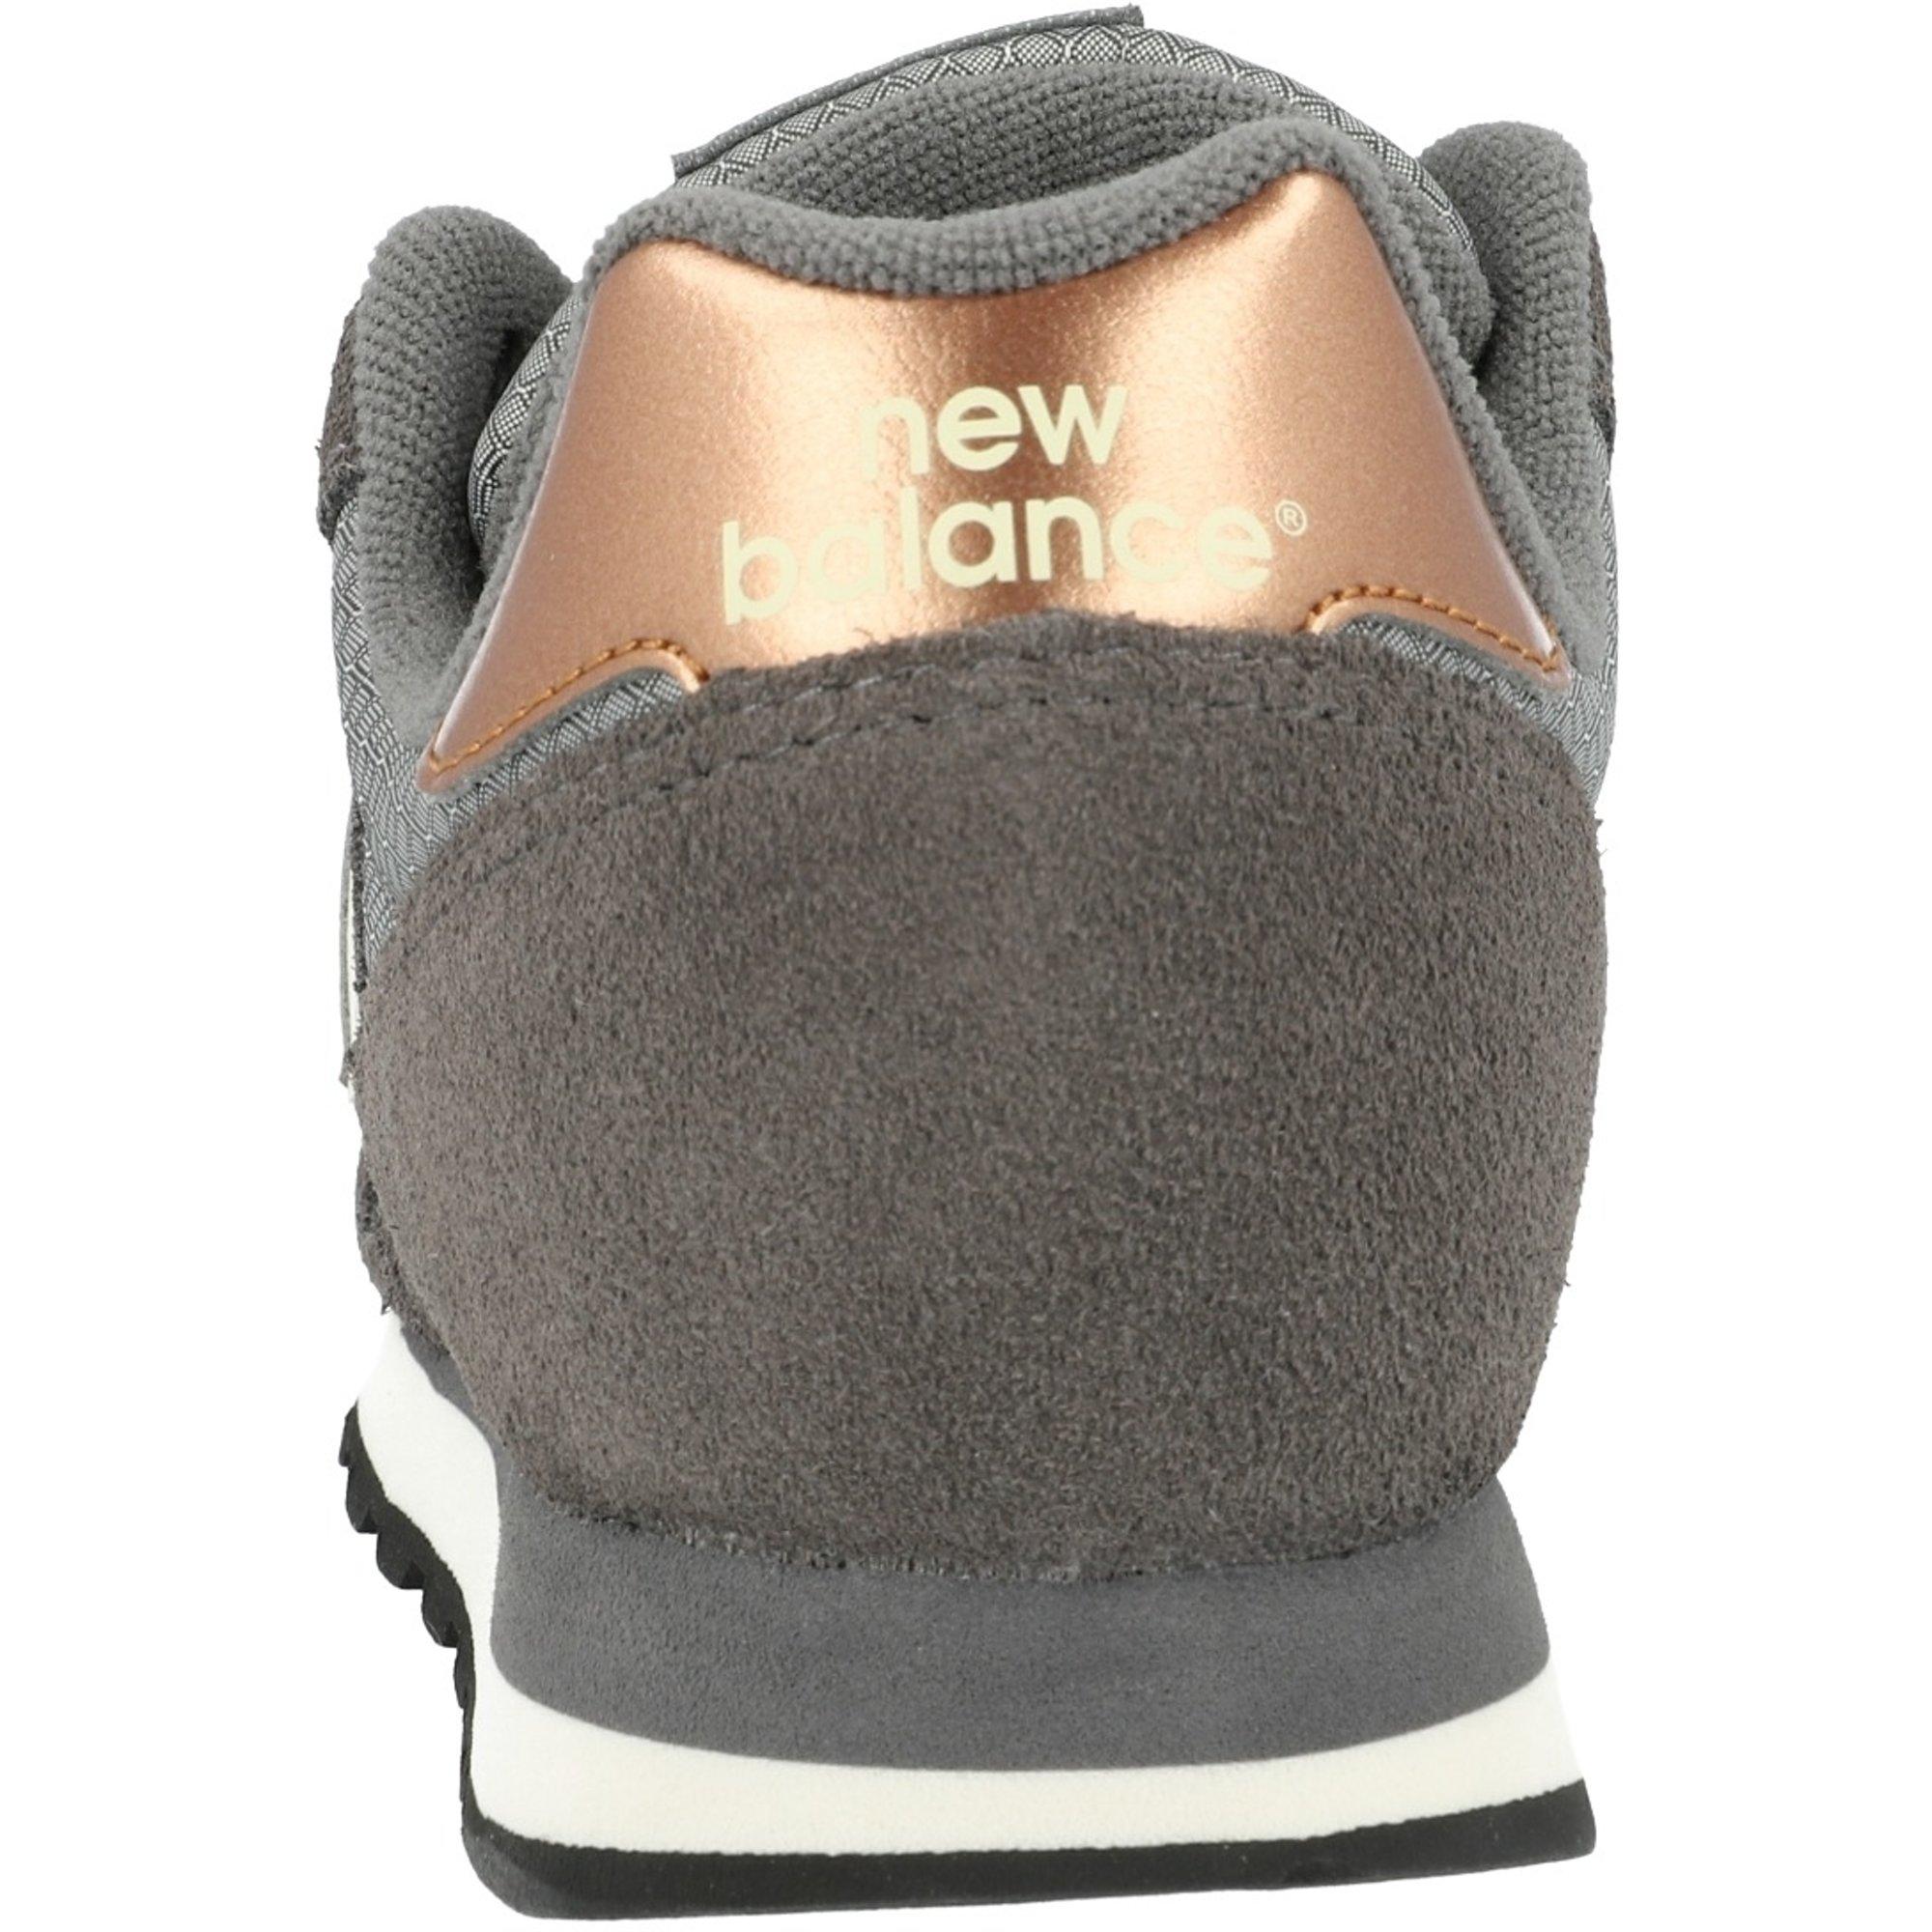 New Balance 373 Castlerock/Copper